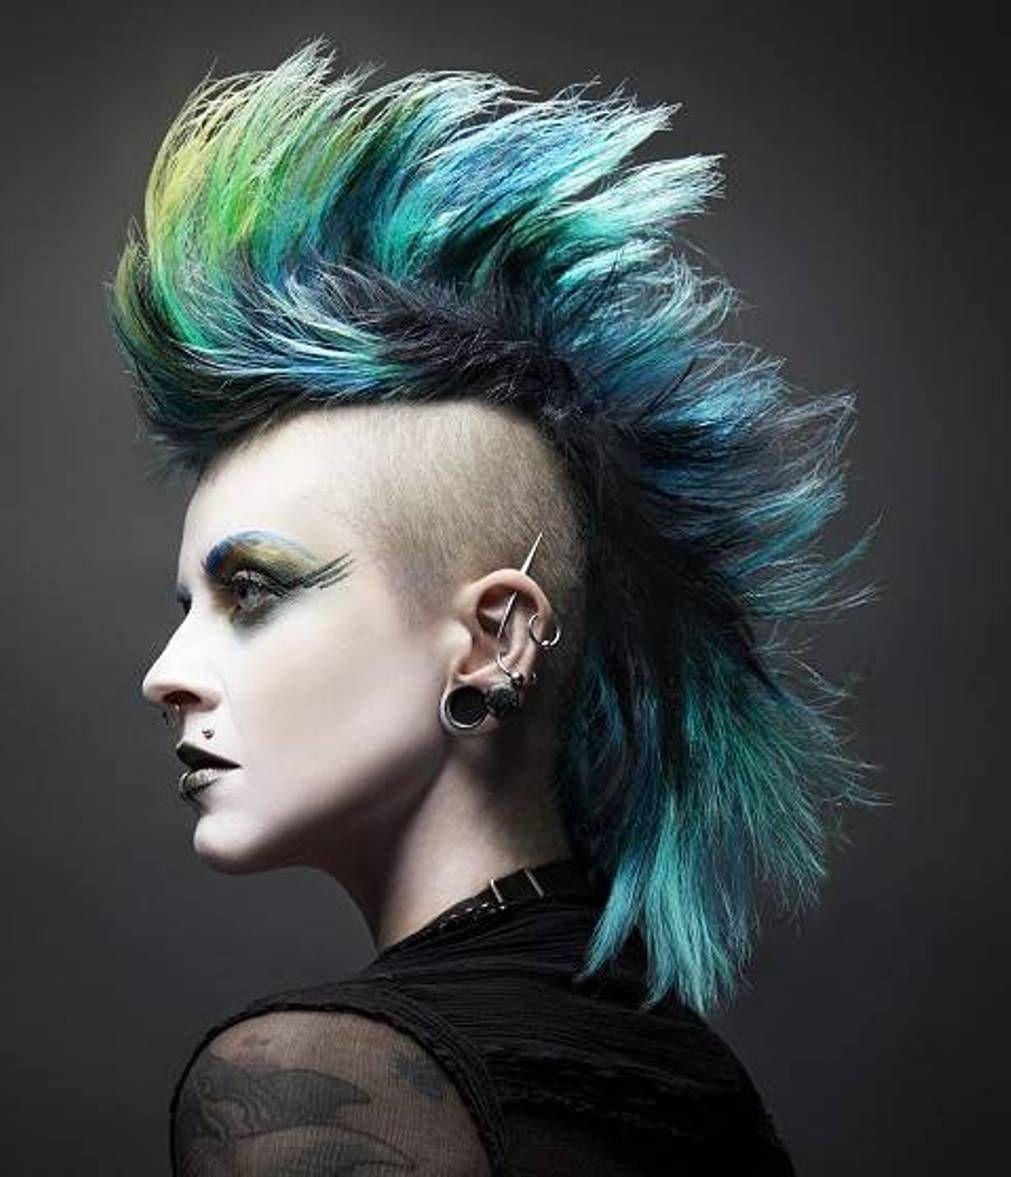 Hairstyle Neo Pop Punk Hairstyles Punk Haircut Rock Hairstyles Goth Hair